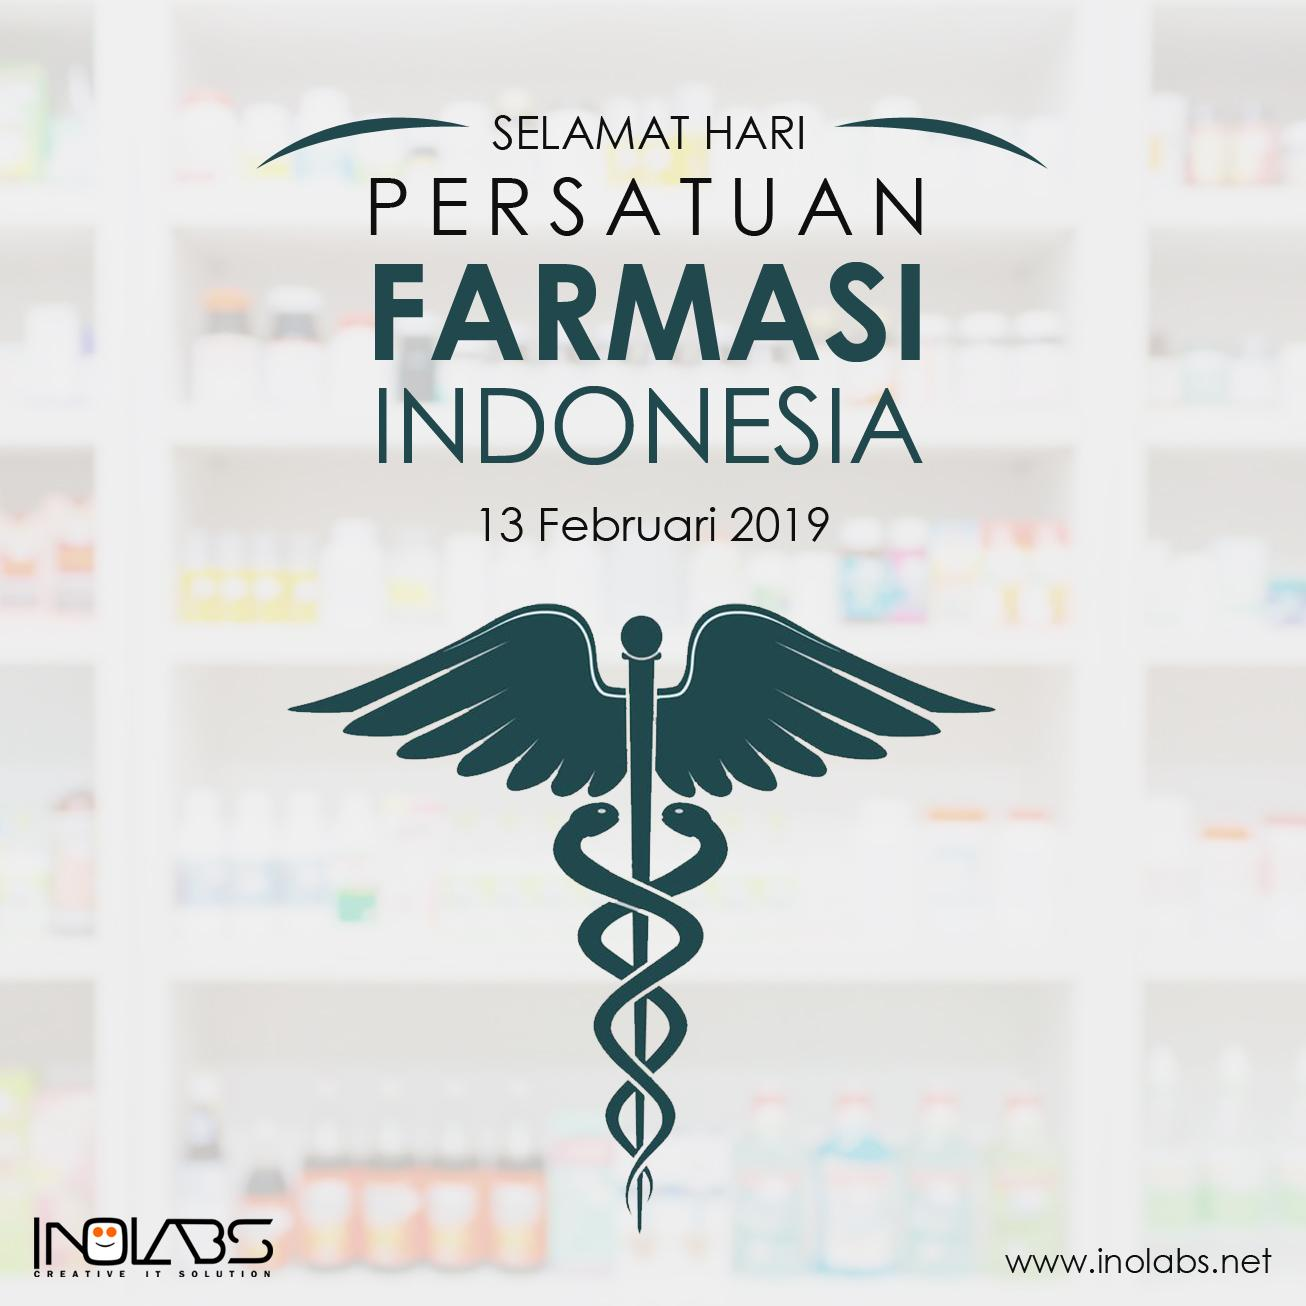 Dirgahayu Persatuan Ahli Farmasi Indonesia ke-73